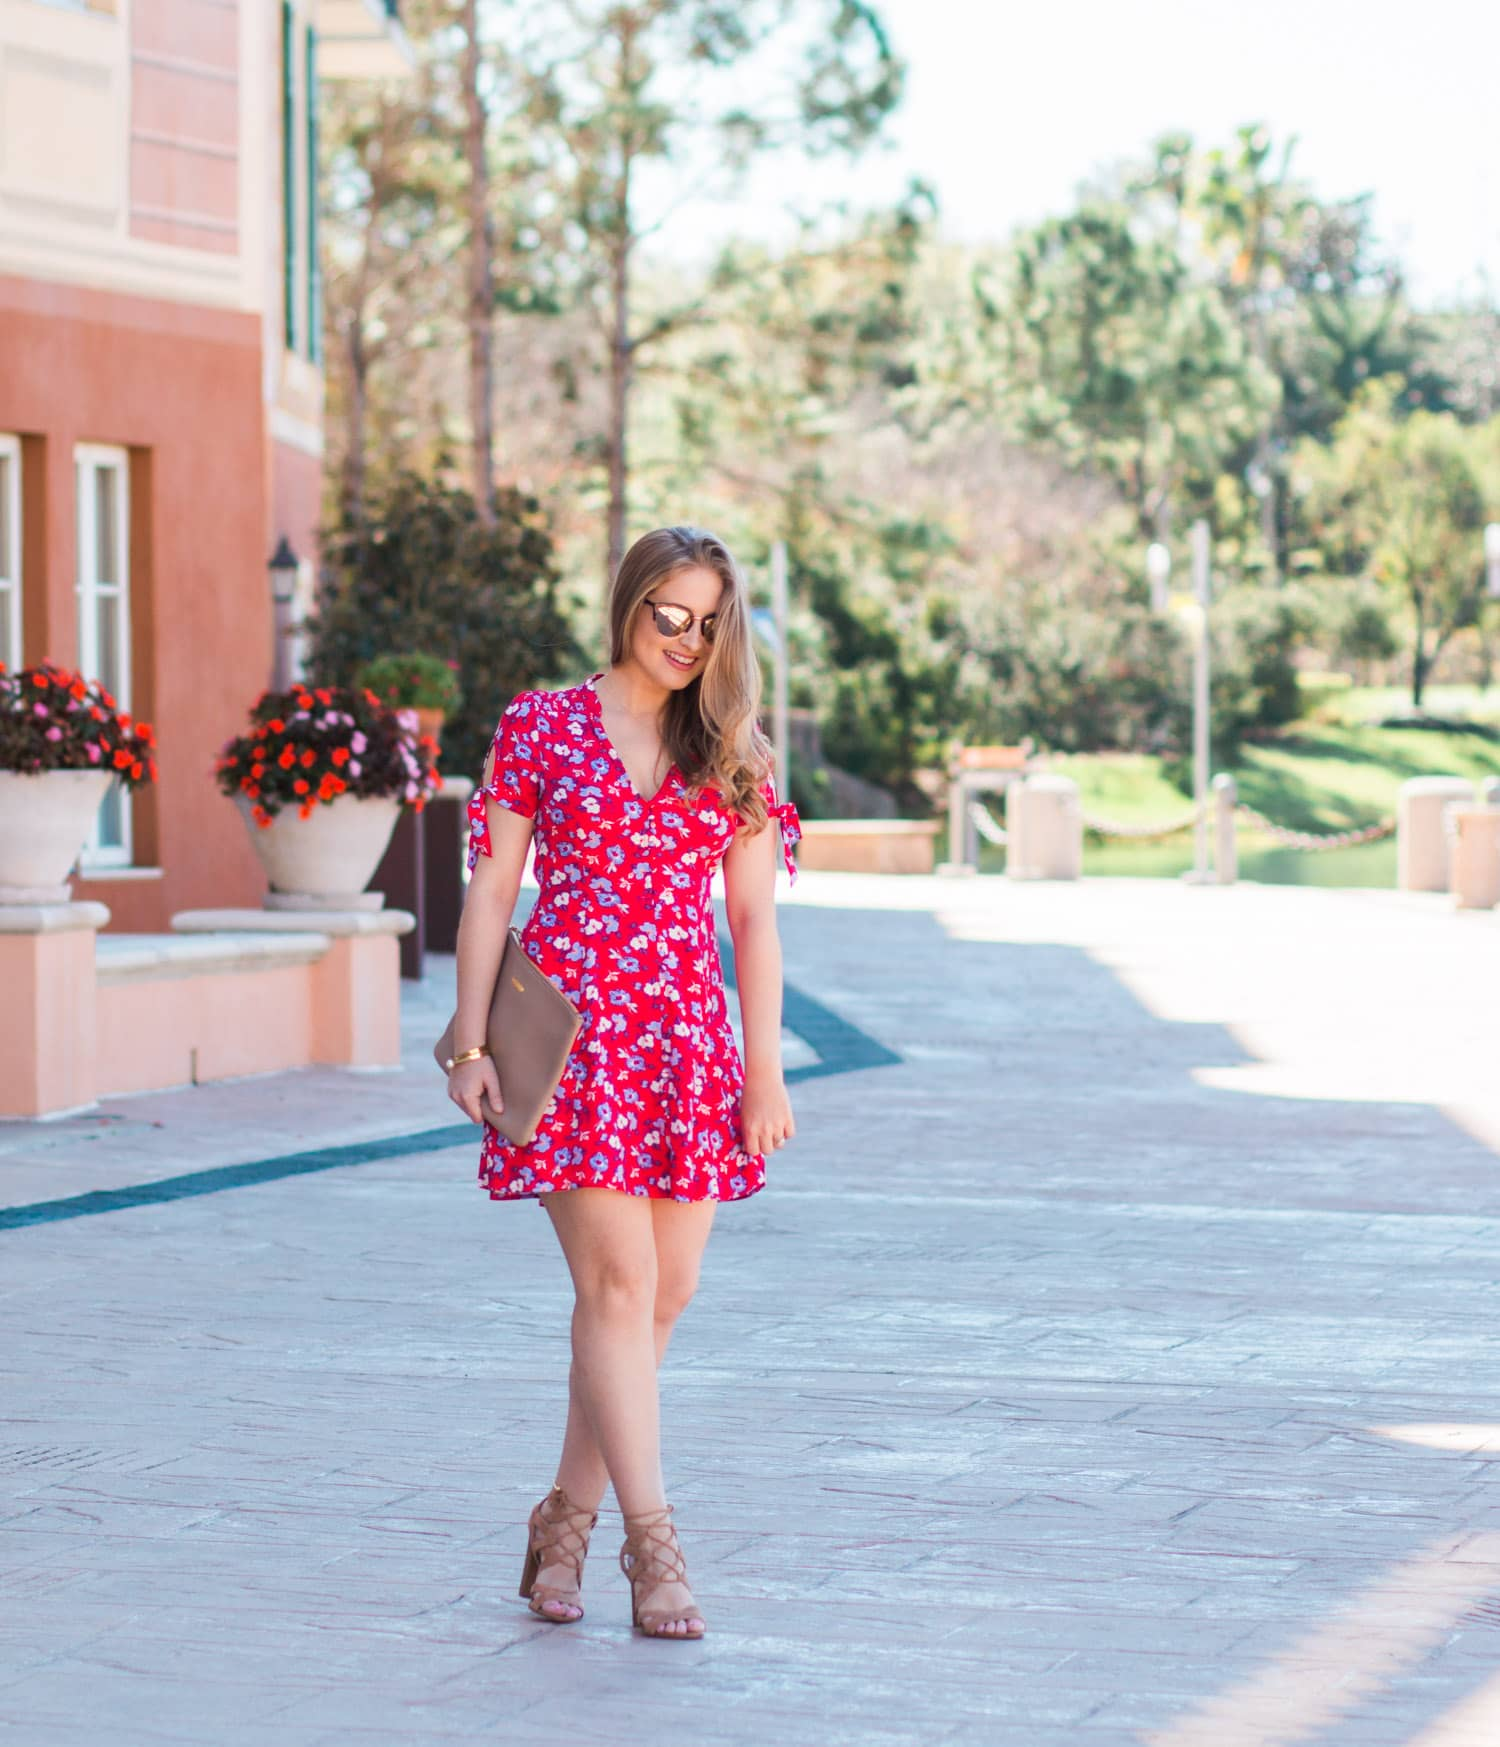 Portofino Bay Hotel woman Walking Floral Dress Sun